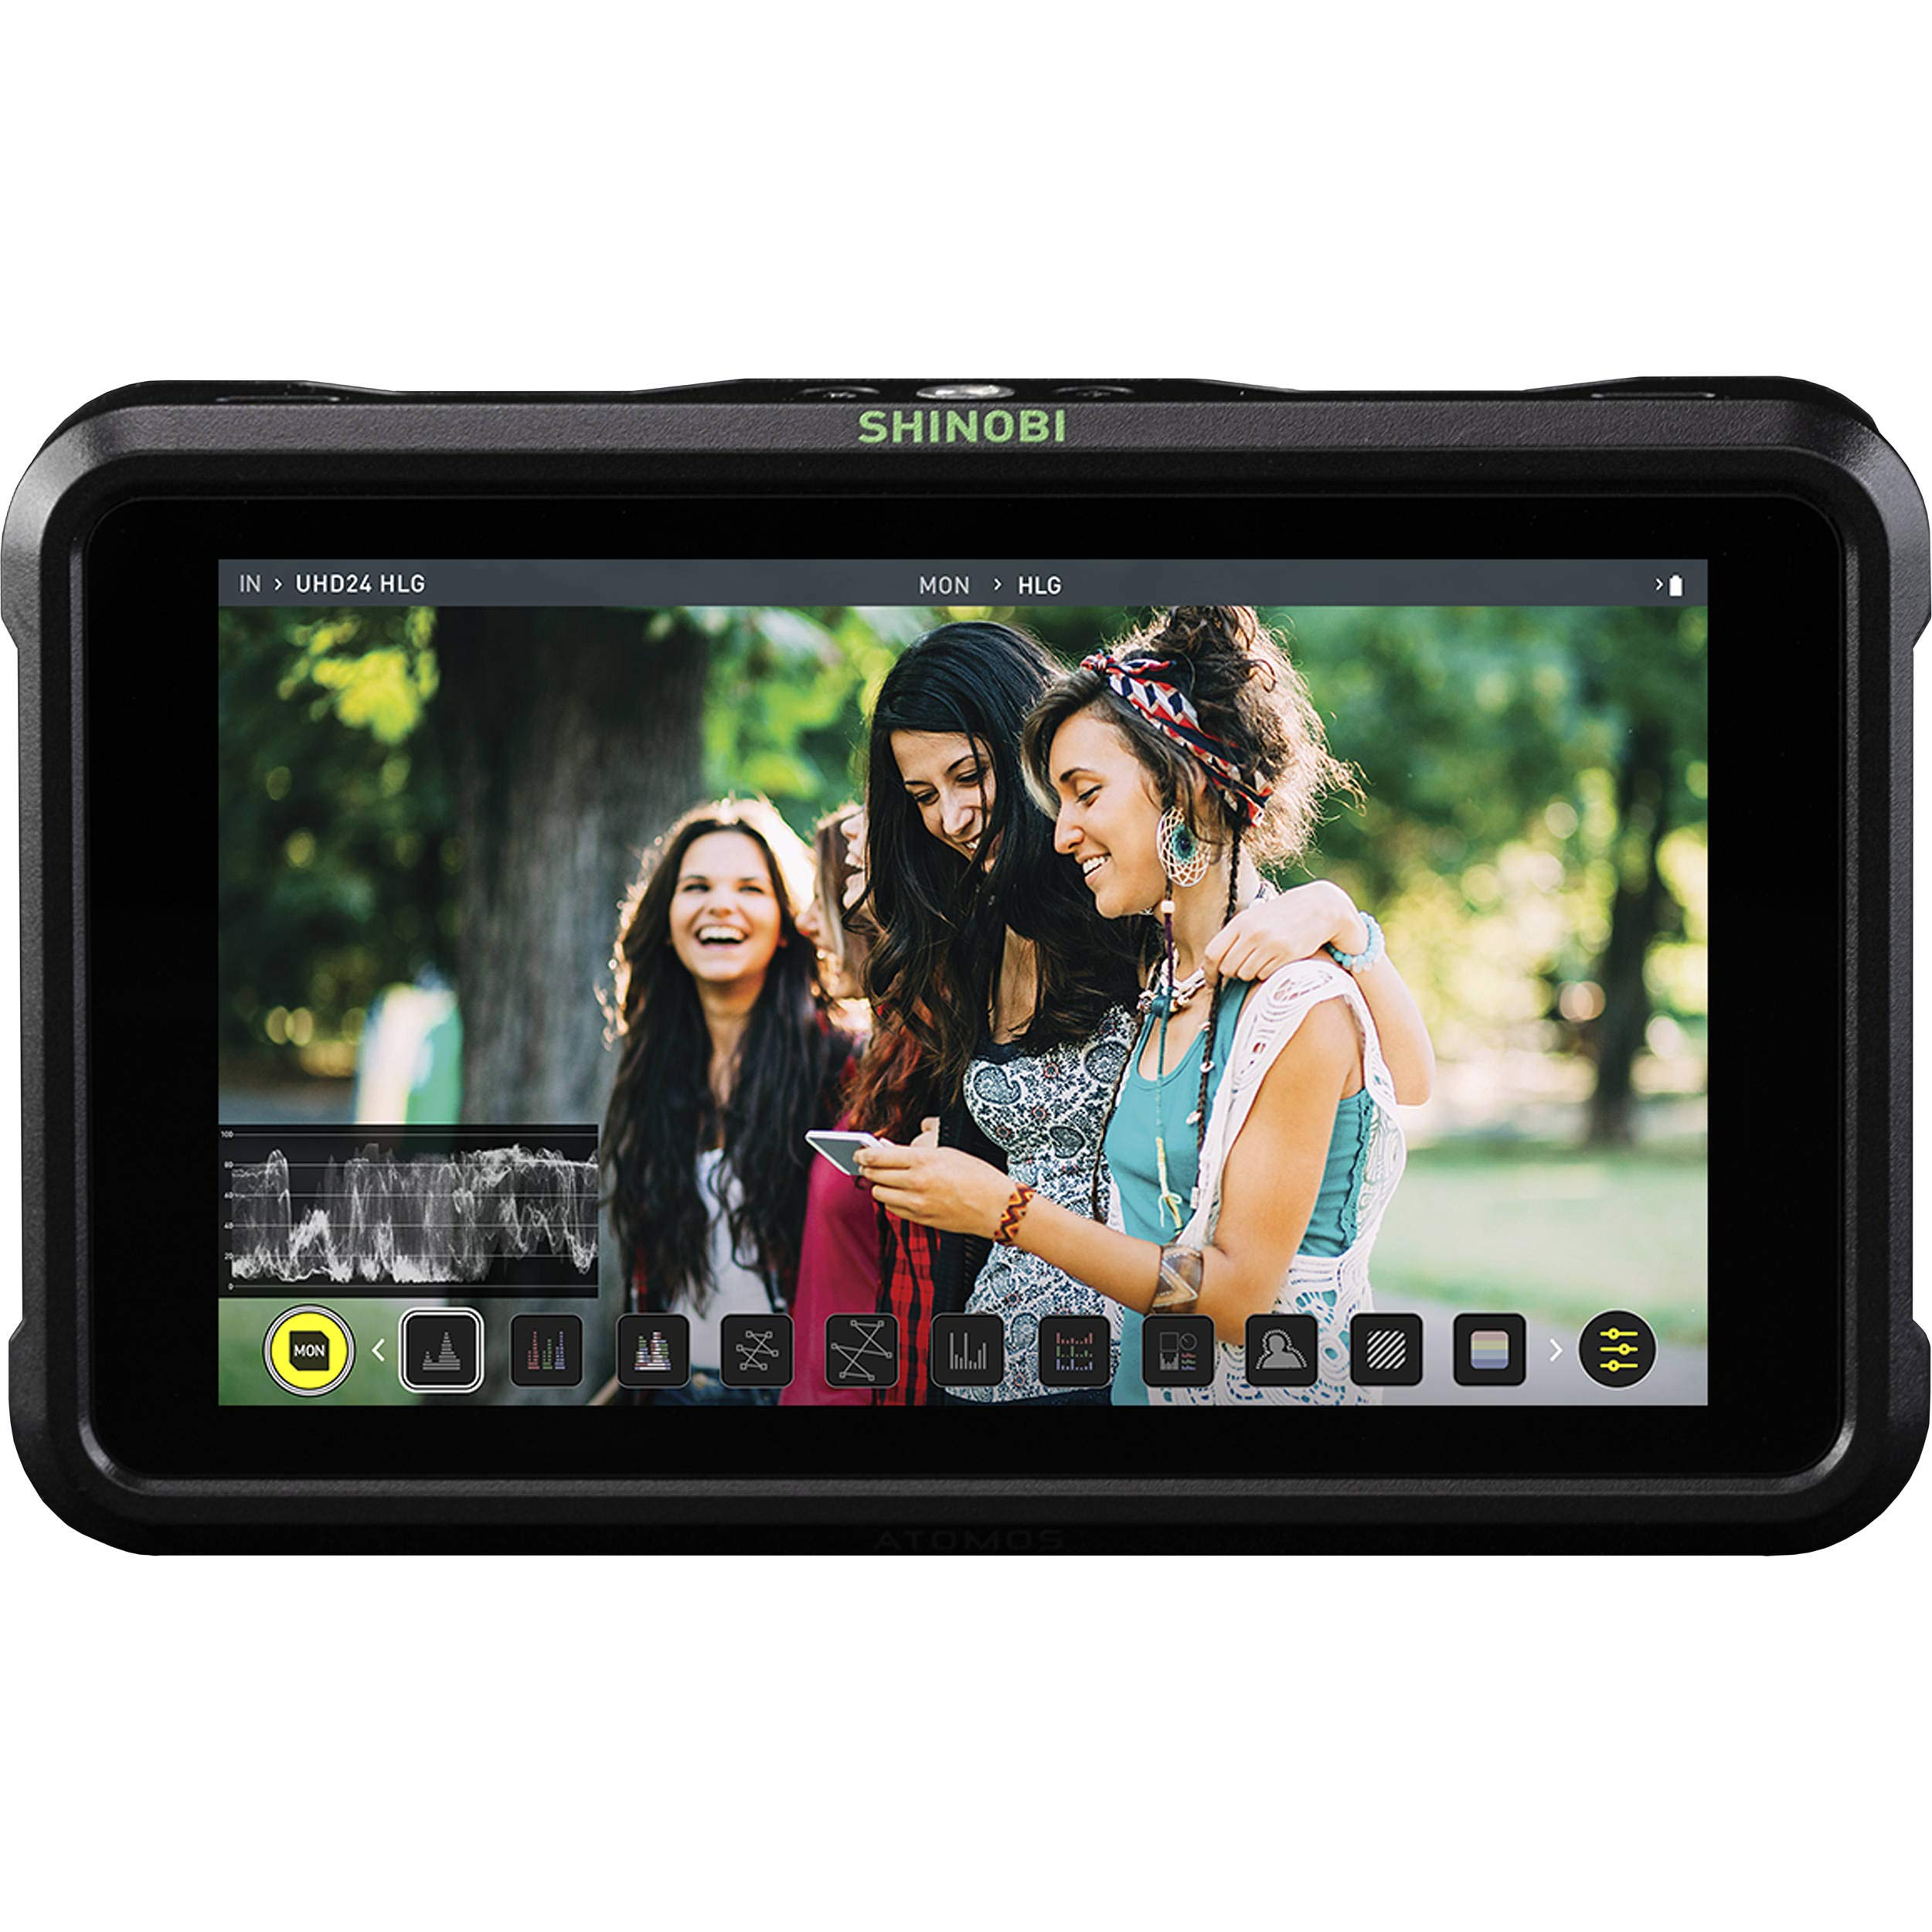 Atomos Shinobi SDI 5'' 3G-SDI & 4K HDMI Pro Monitor